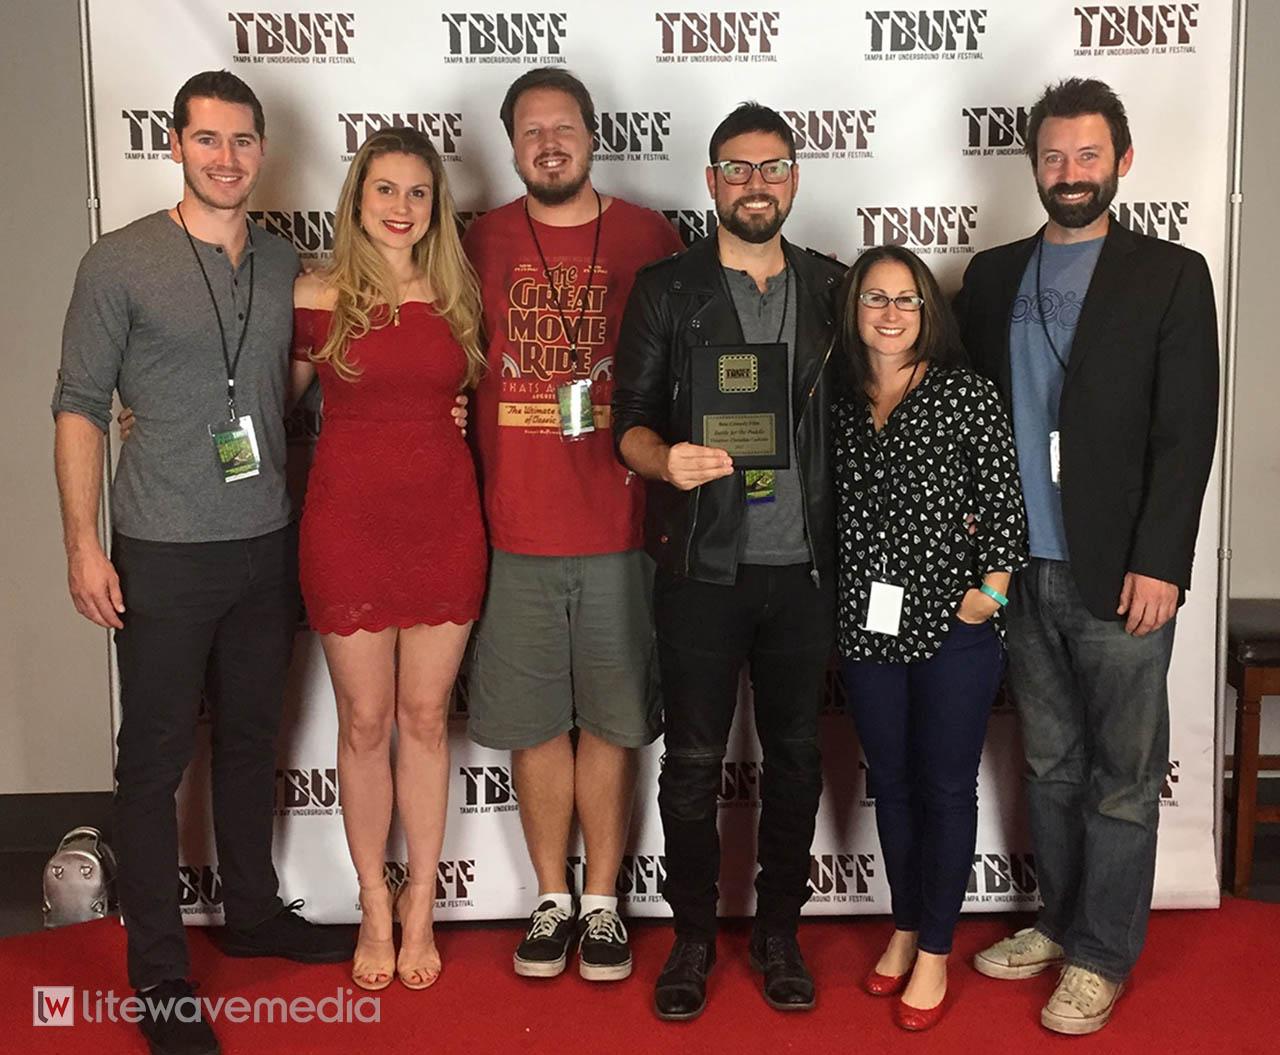 Tampa Film Company wins Best Comedy Film at film festival.